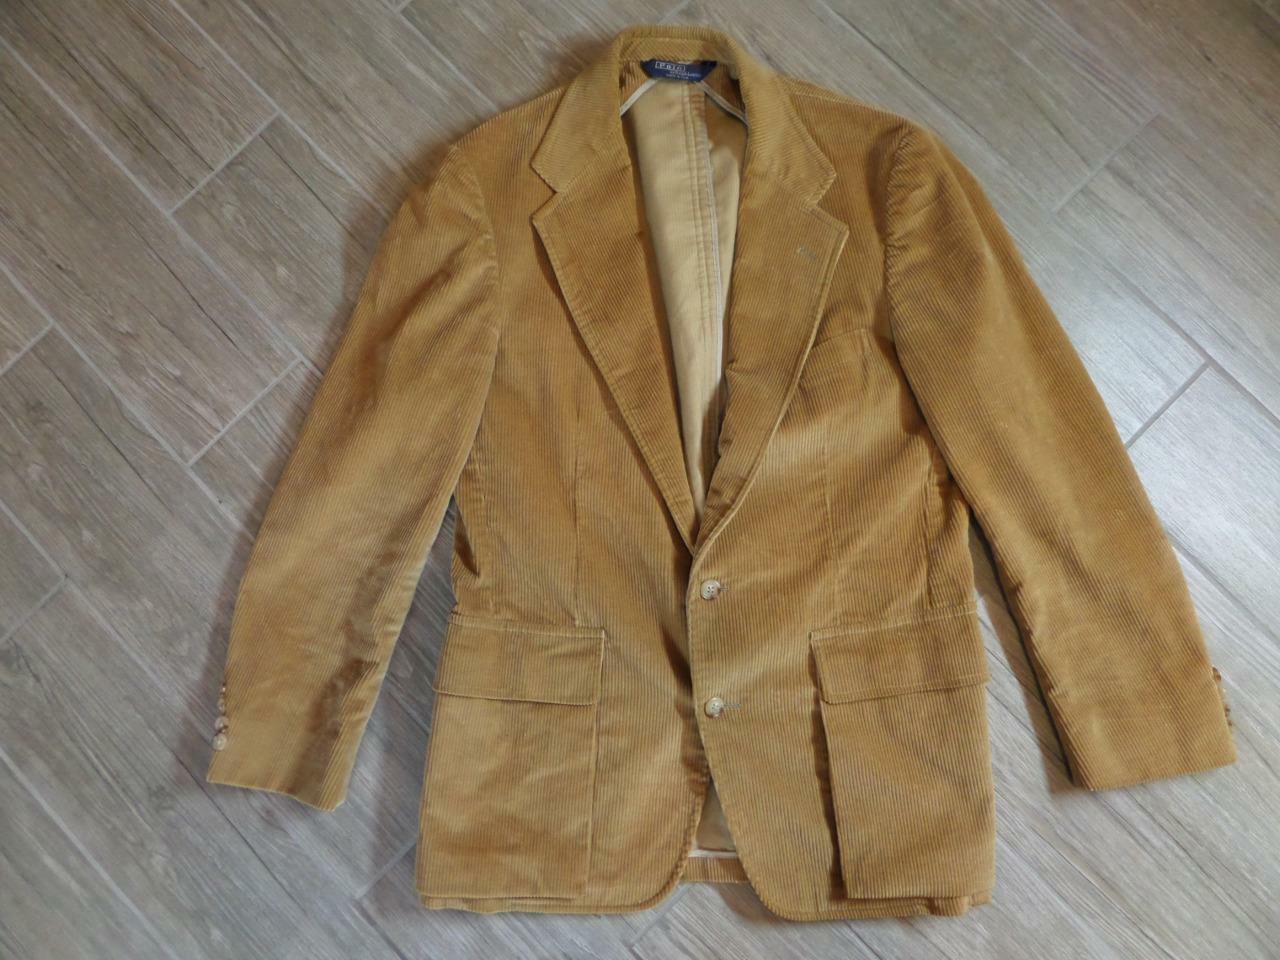 Vintage POLO Ralph Lauren CORDUROY Blazer 42R Light Brown SPORTSCOAT